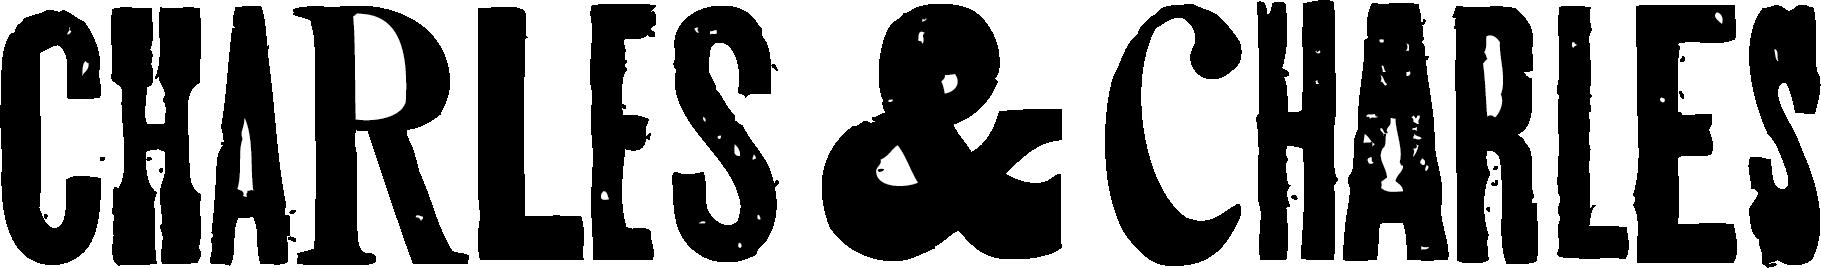 Charles & Charles EPS Logo.png